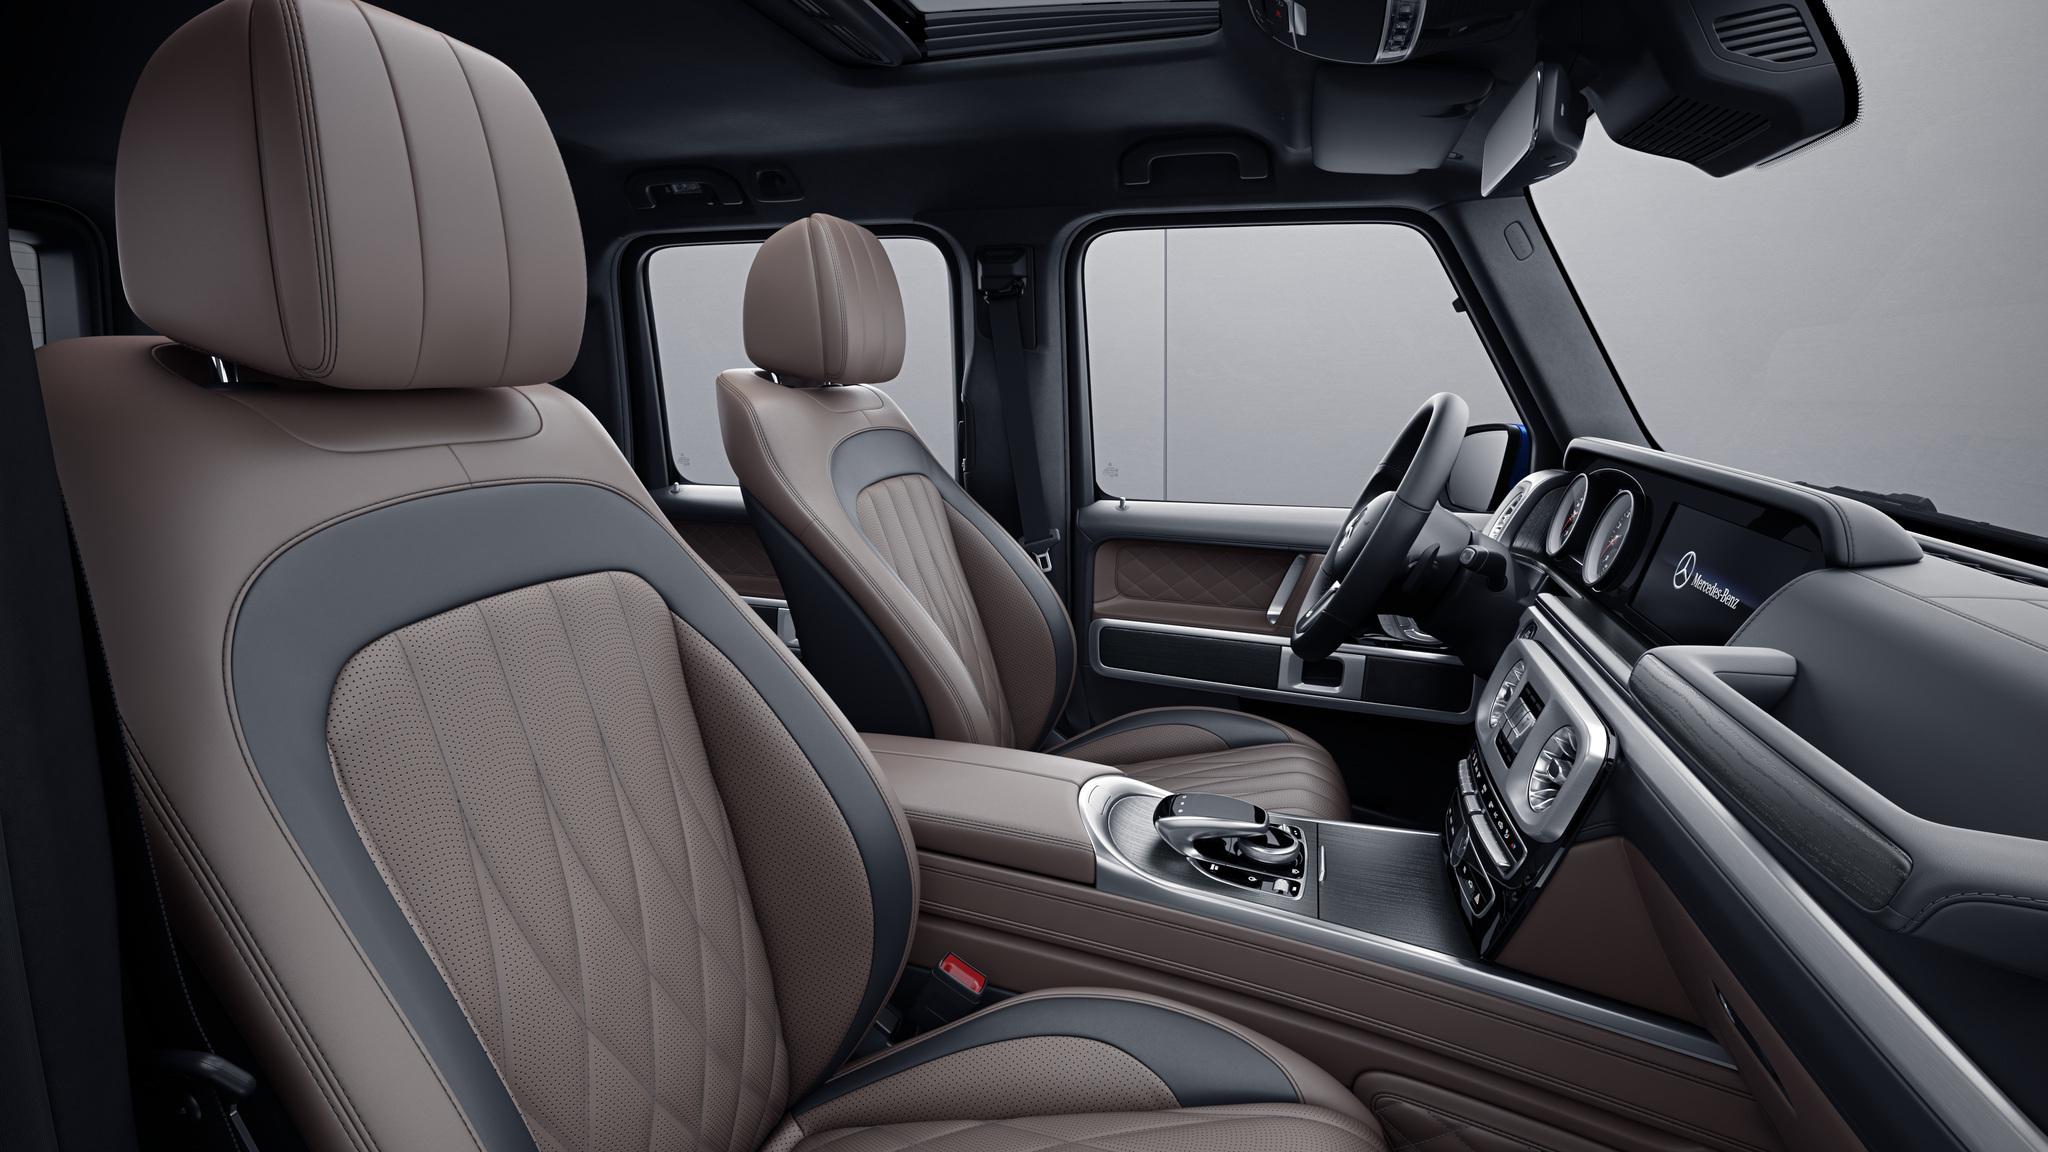 Habitacle de la Mercedes Classe G avec une Sellerie cuir nappa bicolore - marron tartuffe noir